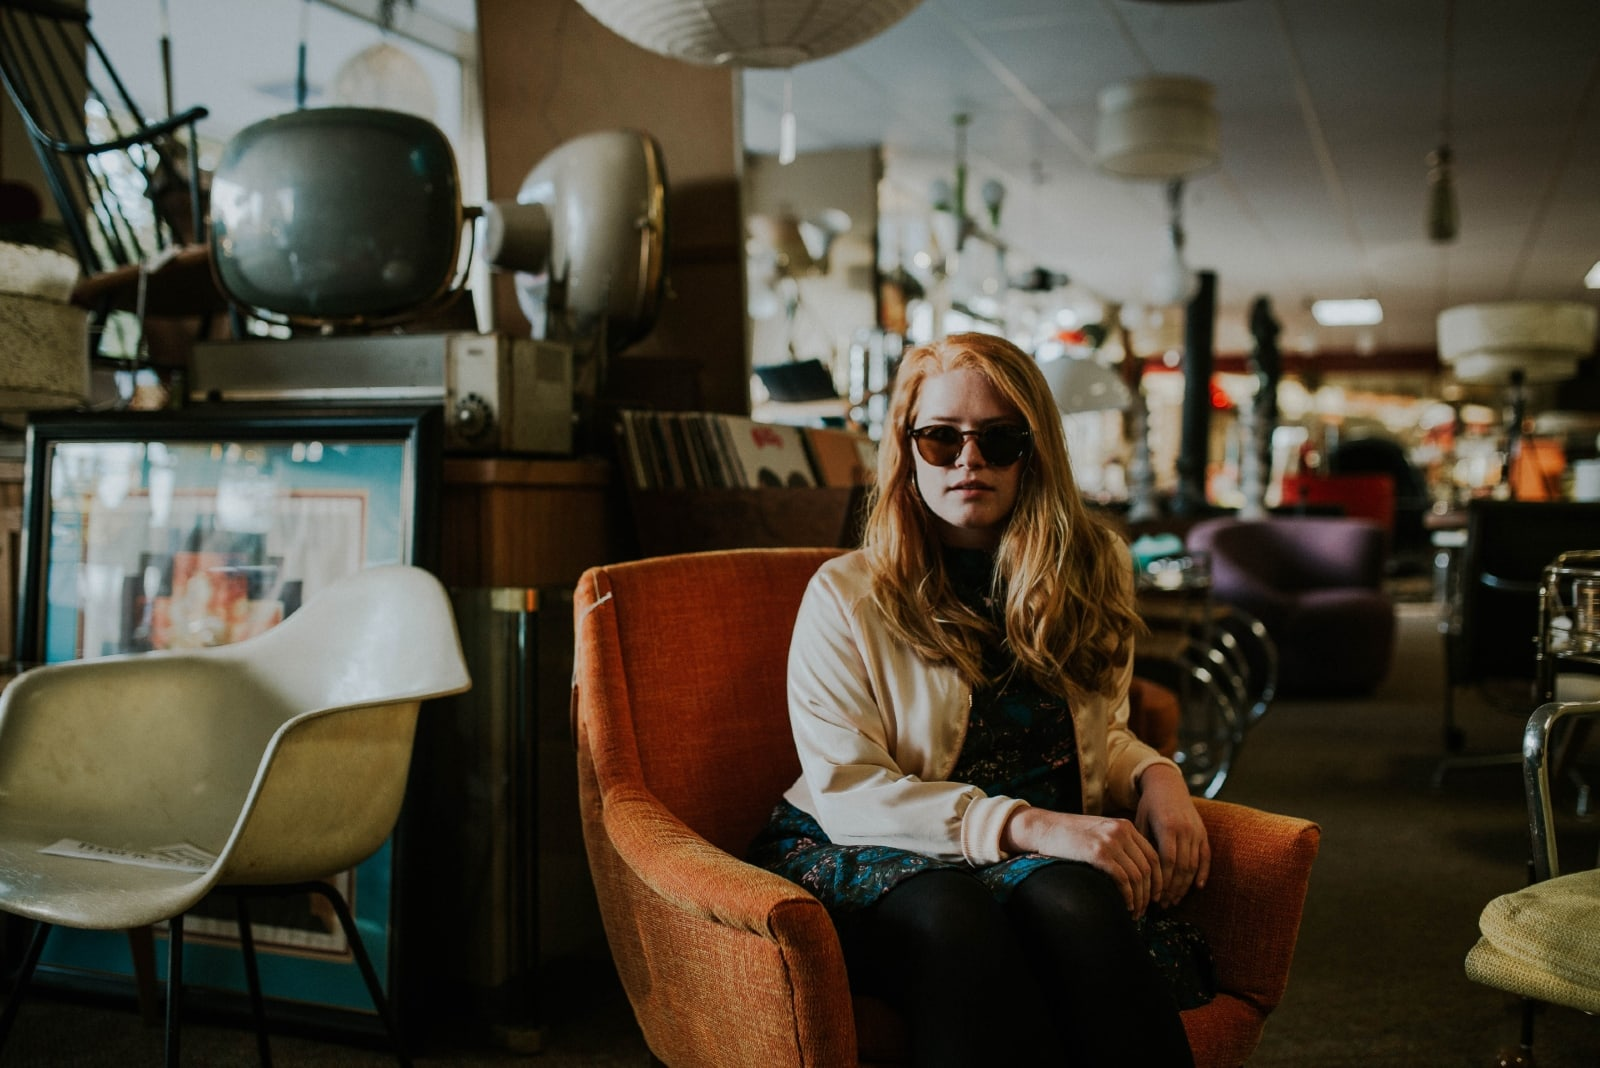 woman with sunglasses sitting on orange armchair